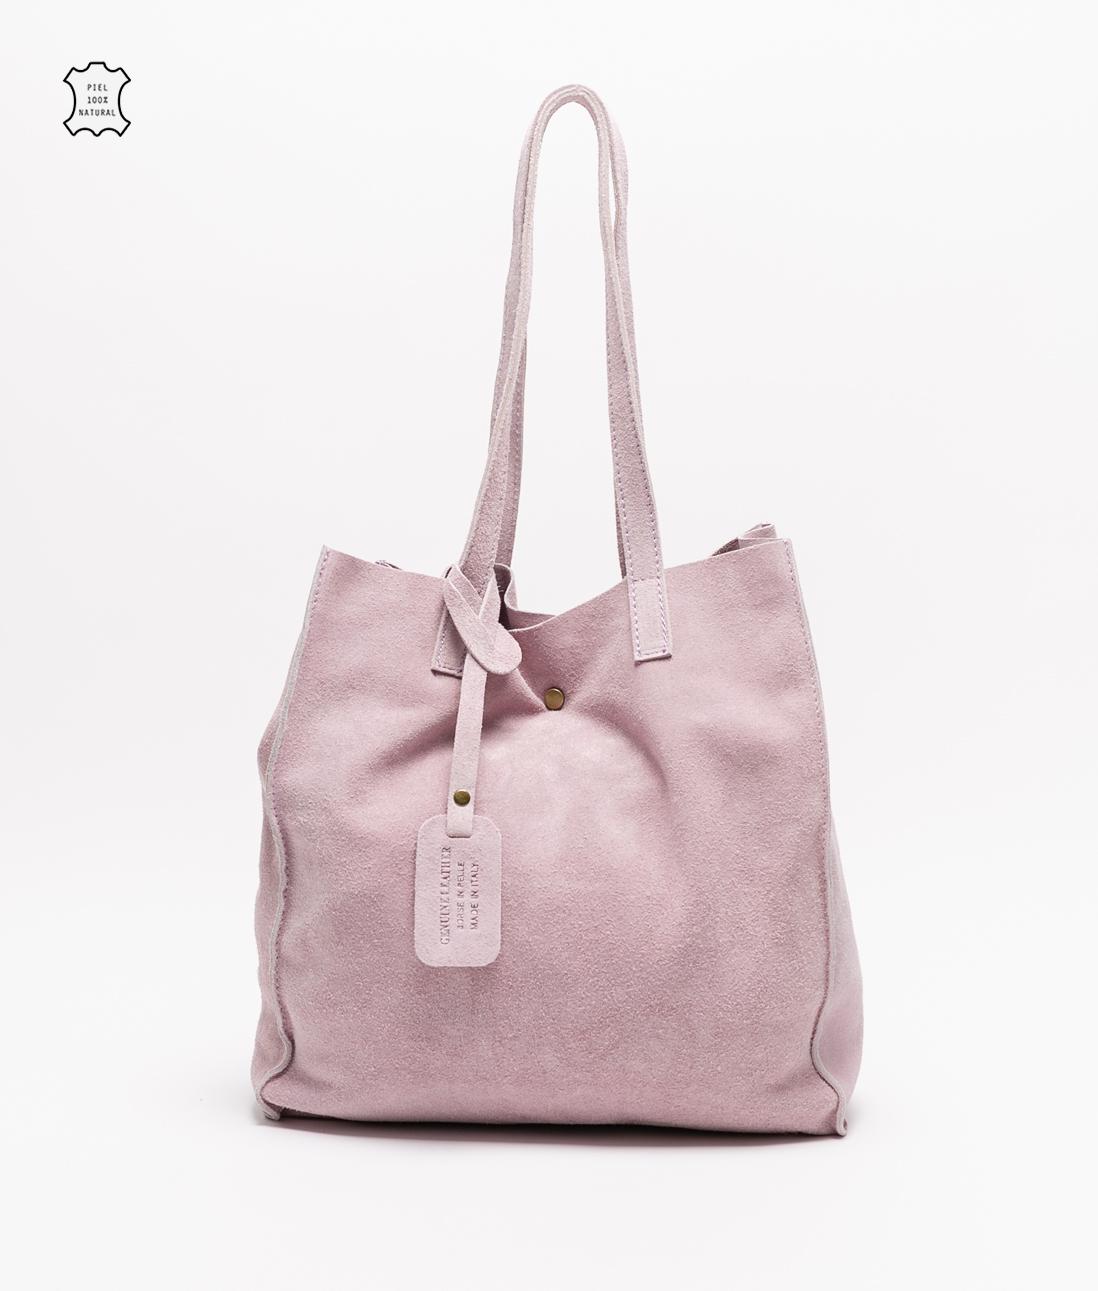 MYKO BAGS - light pink